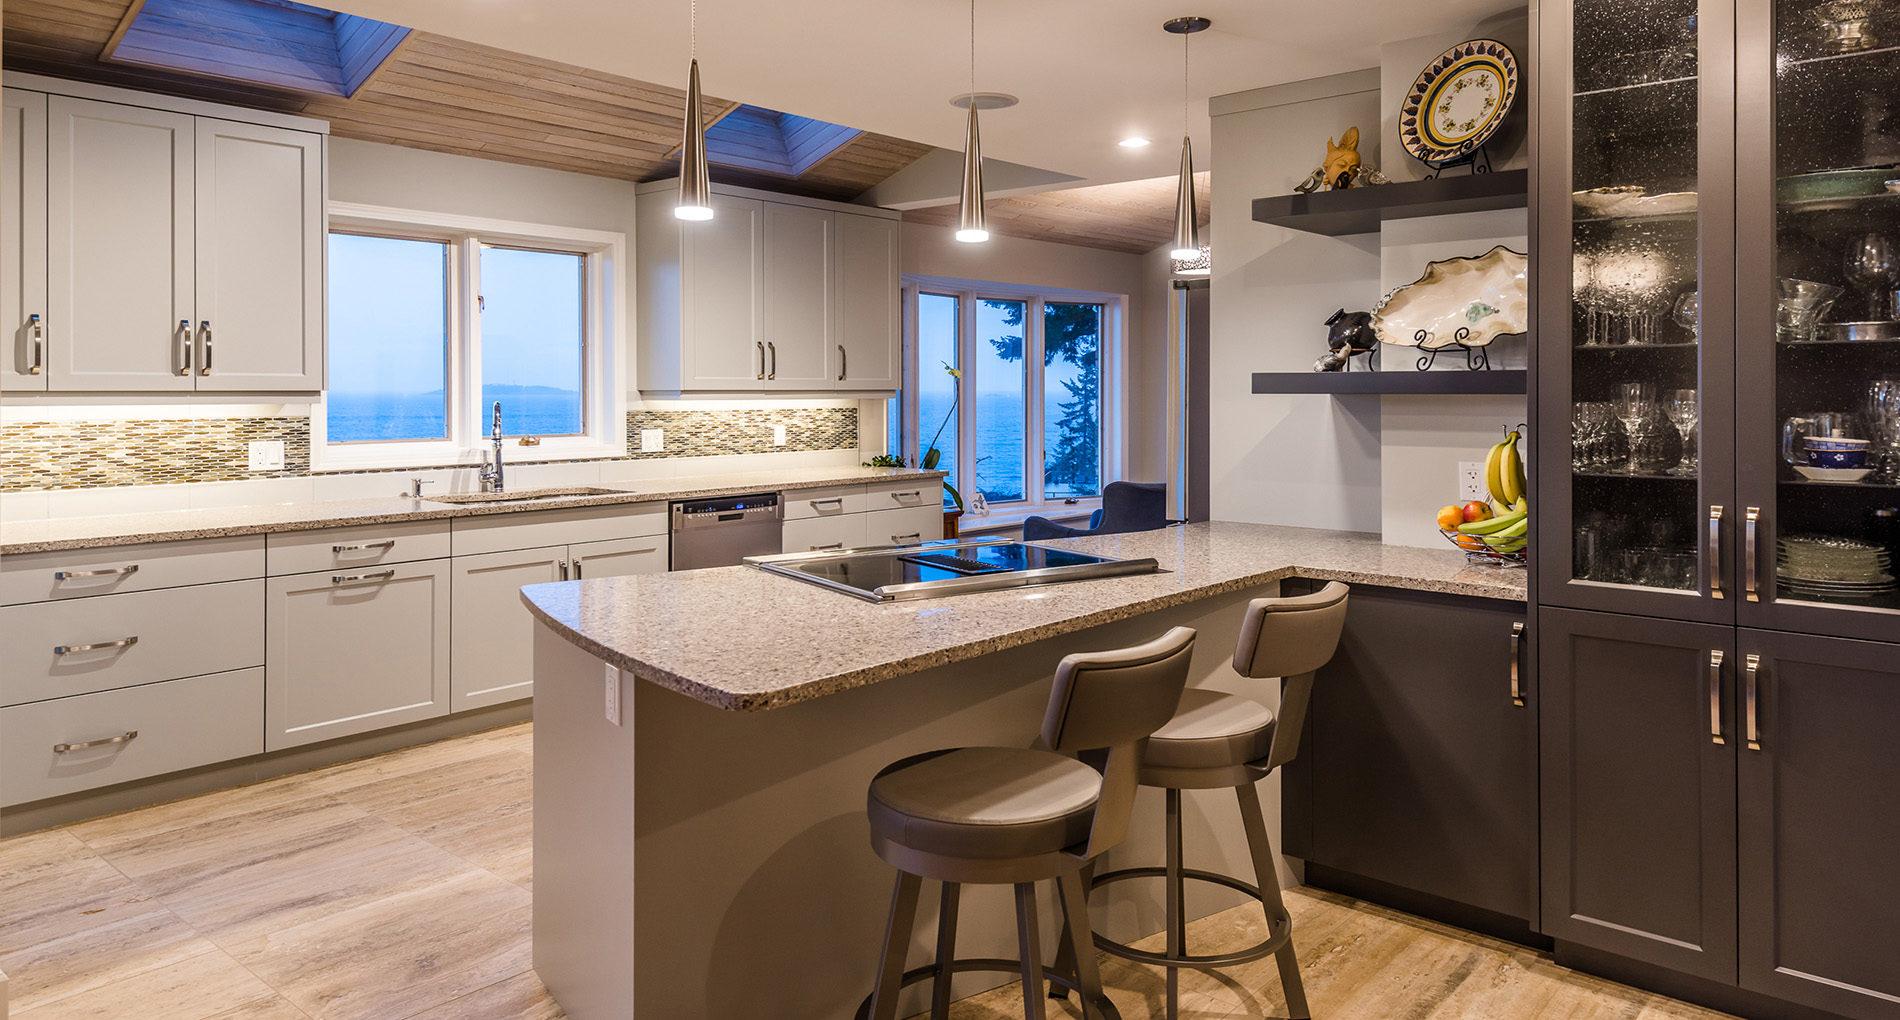 Kitchen Renovation North Island Remora3716 Slider